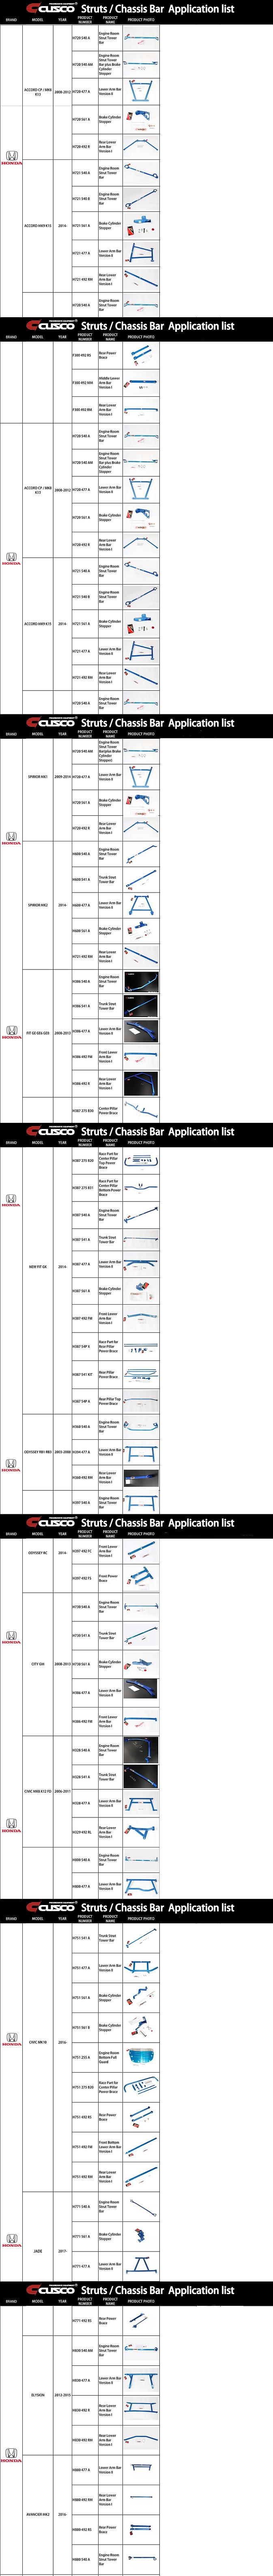 CUSCO-honda-application-list.jpg